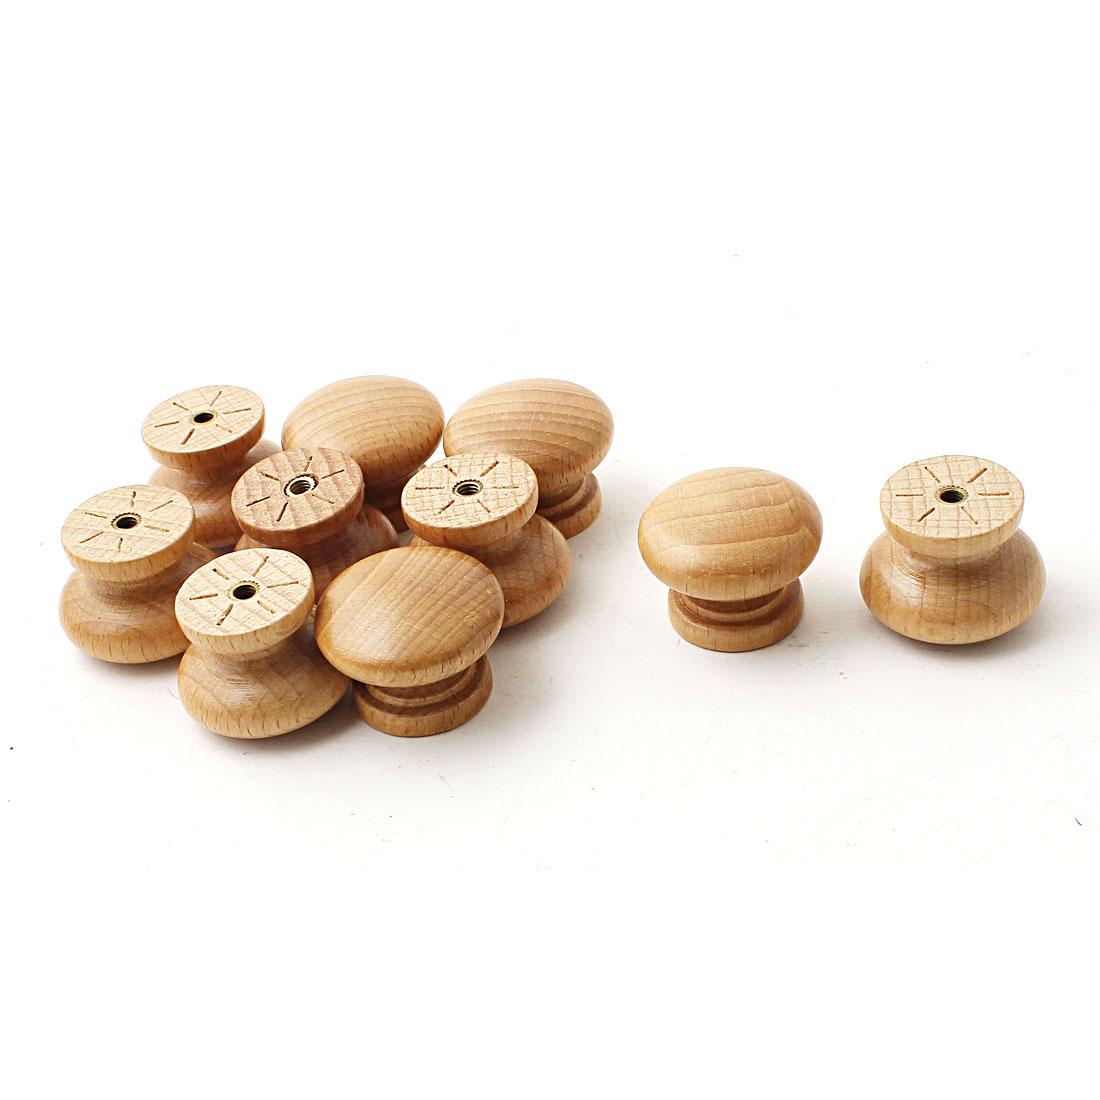 30mm Dia Round Wood Knob Drawer Cabinet Door Pull Handles Khaki 10PCS